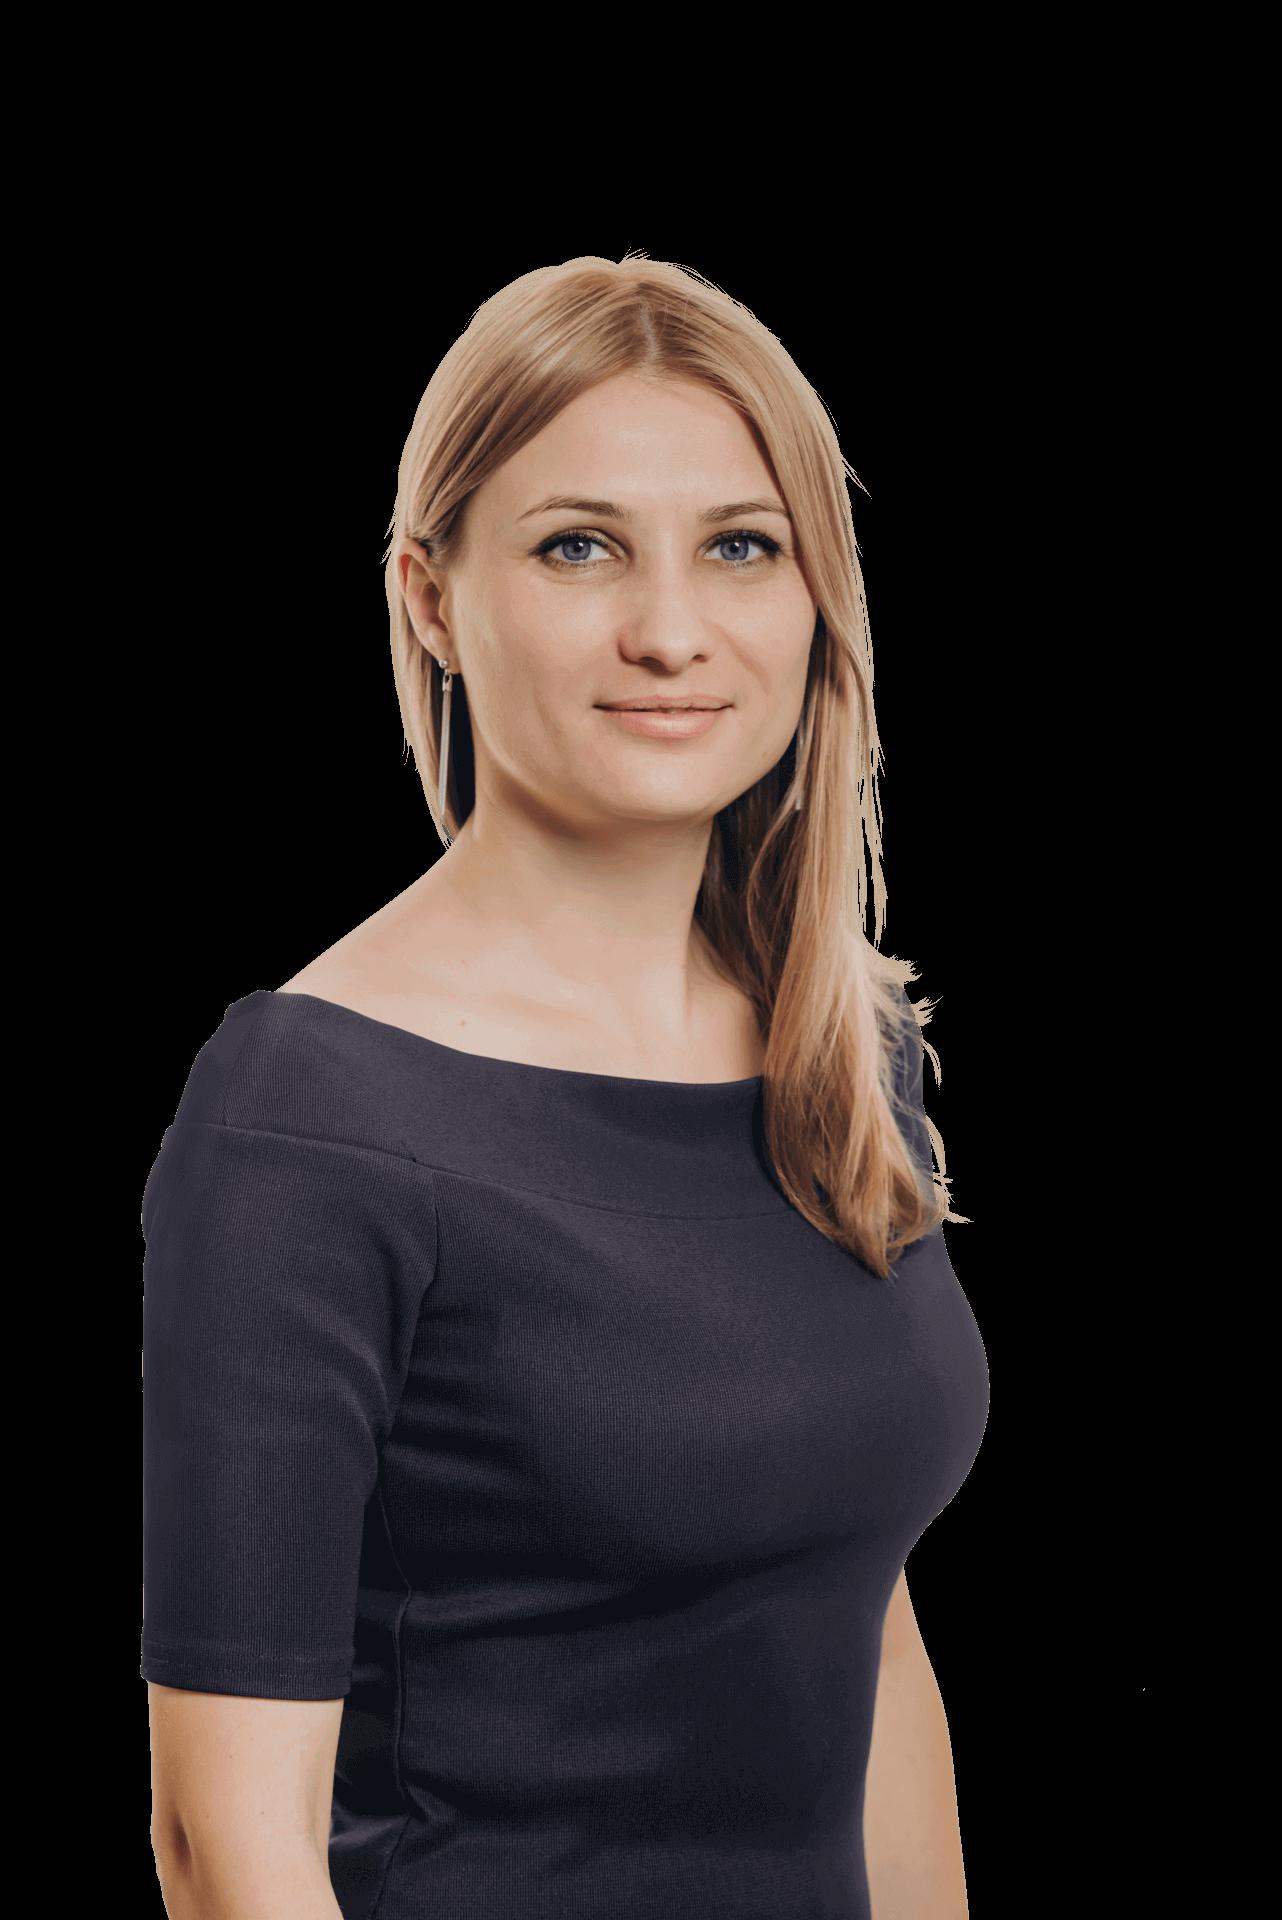 Мирничук-Ковалева <br>Анна Алексеевна